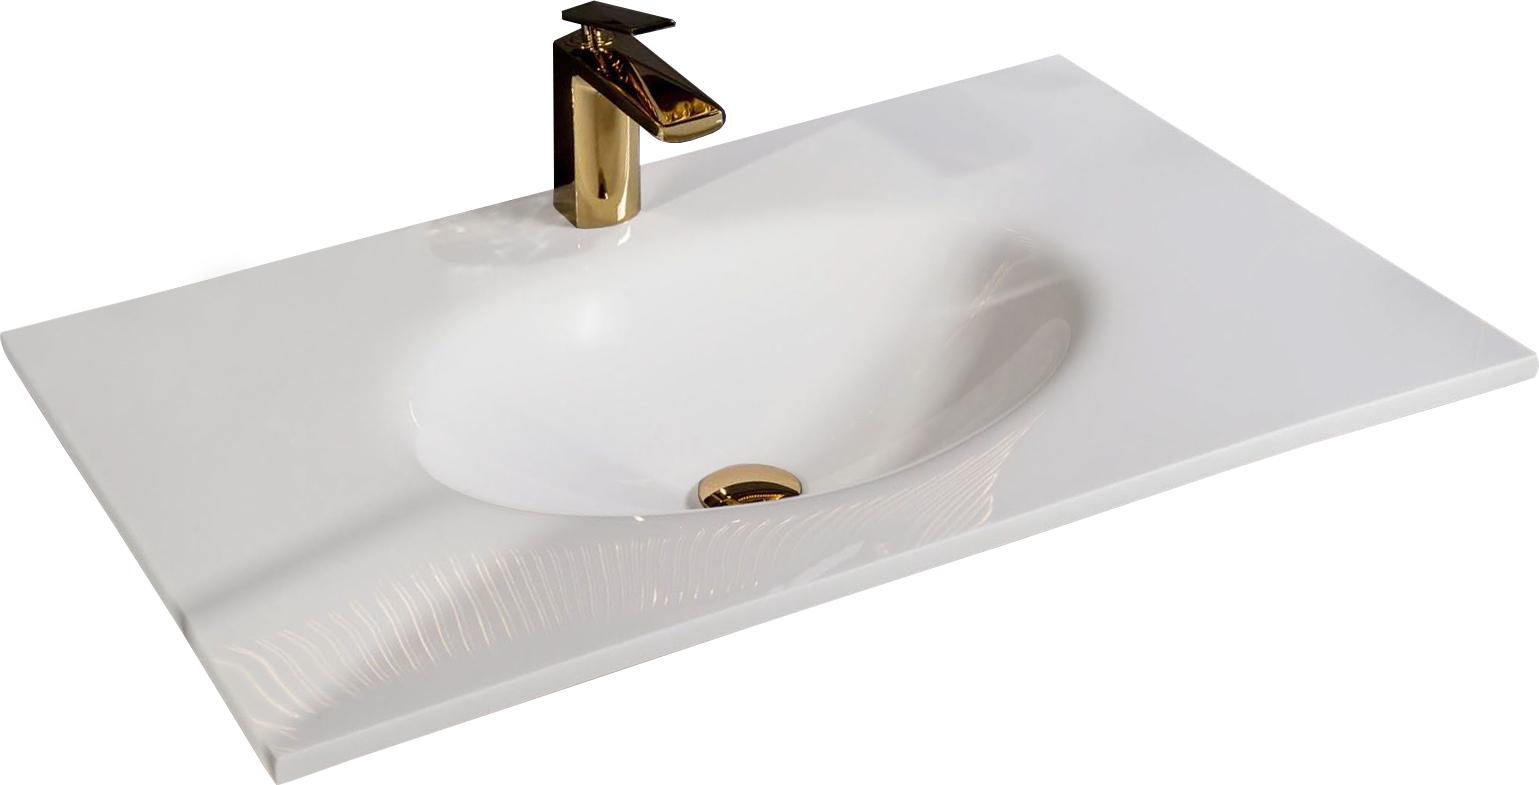 Столешница Solid Glass белая моноблок 81*52см